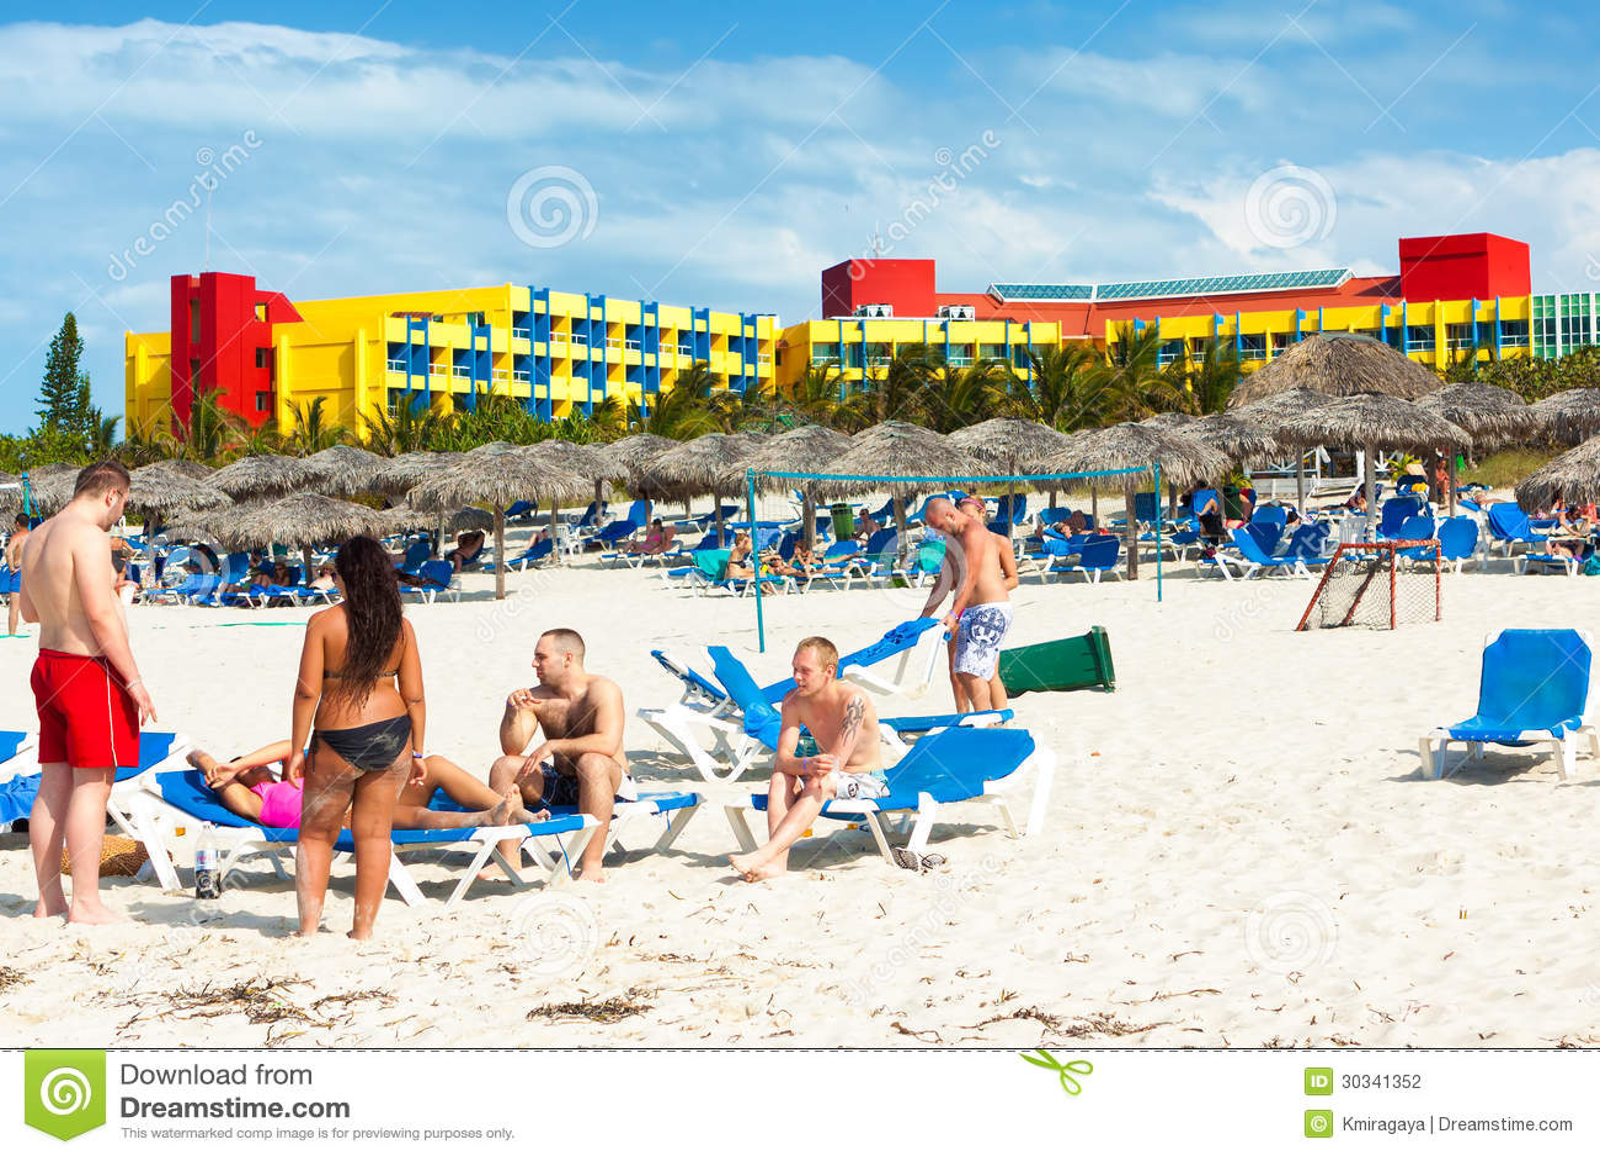 Beach cuba destination hotel varadero